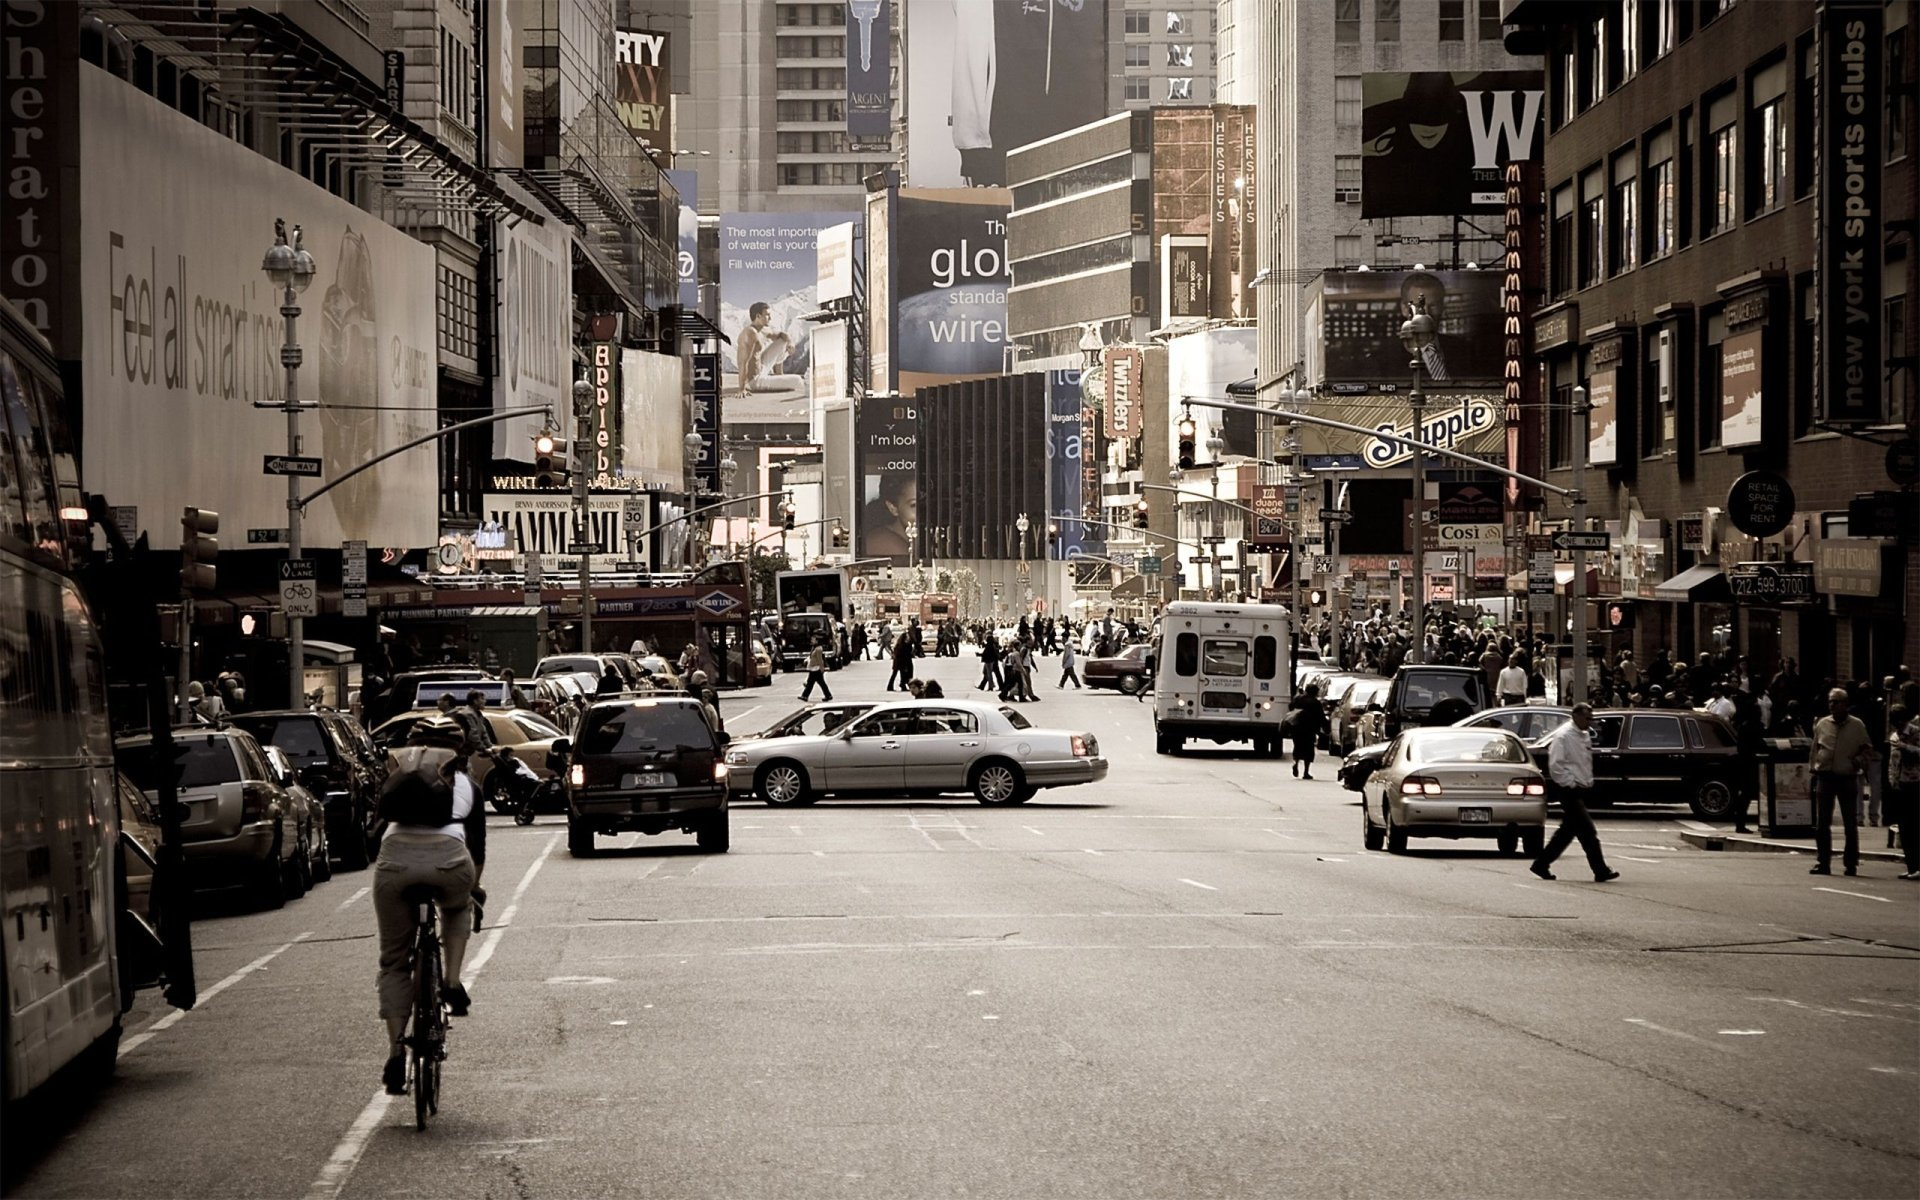 Man Made - City  New York Tilt Shift Wallpaper